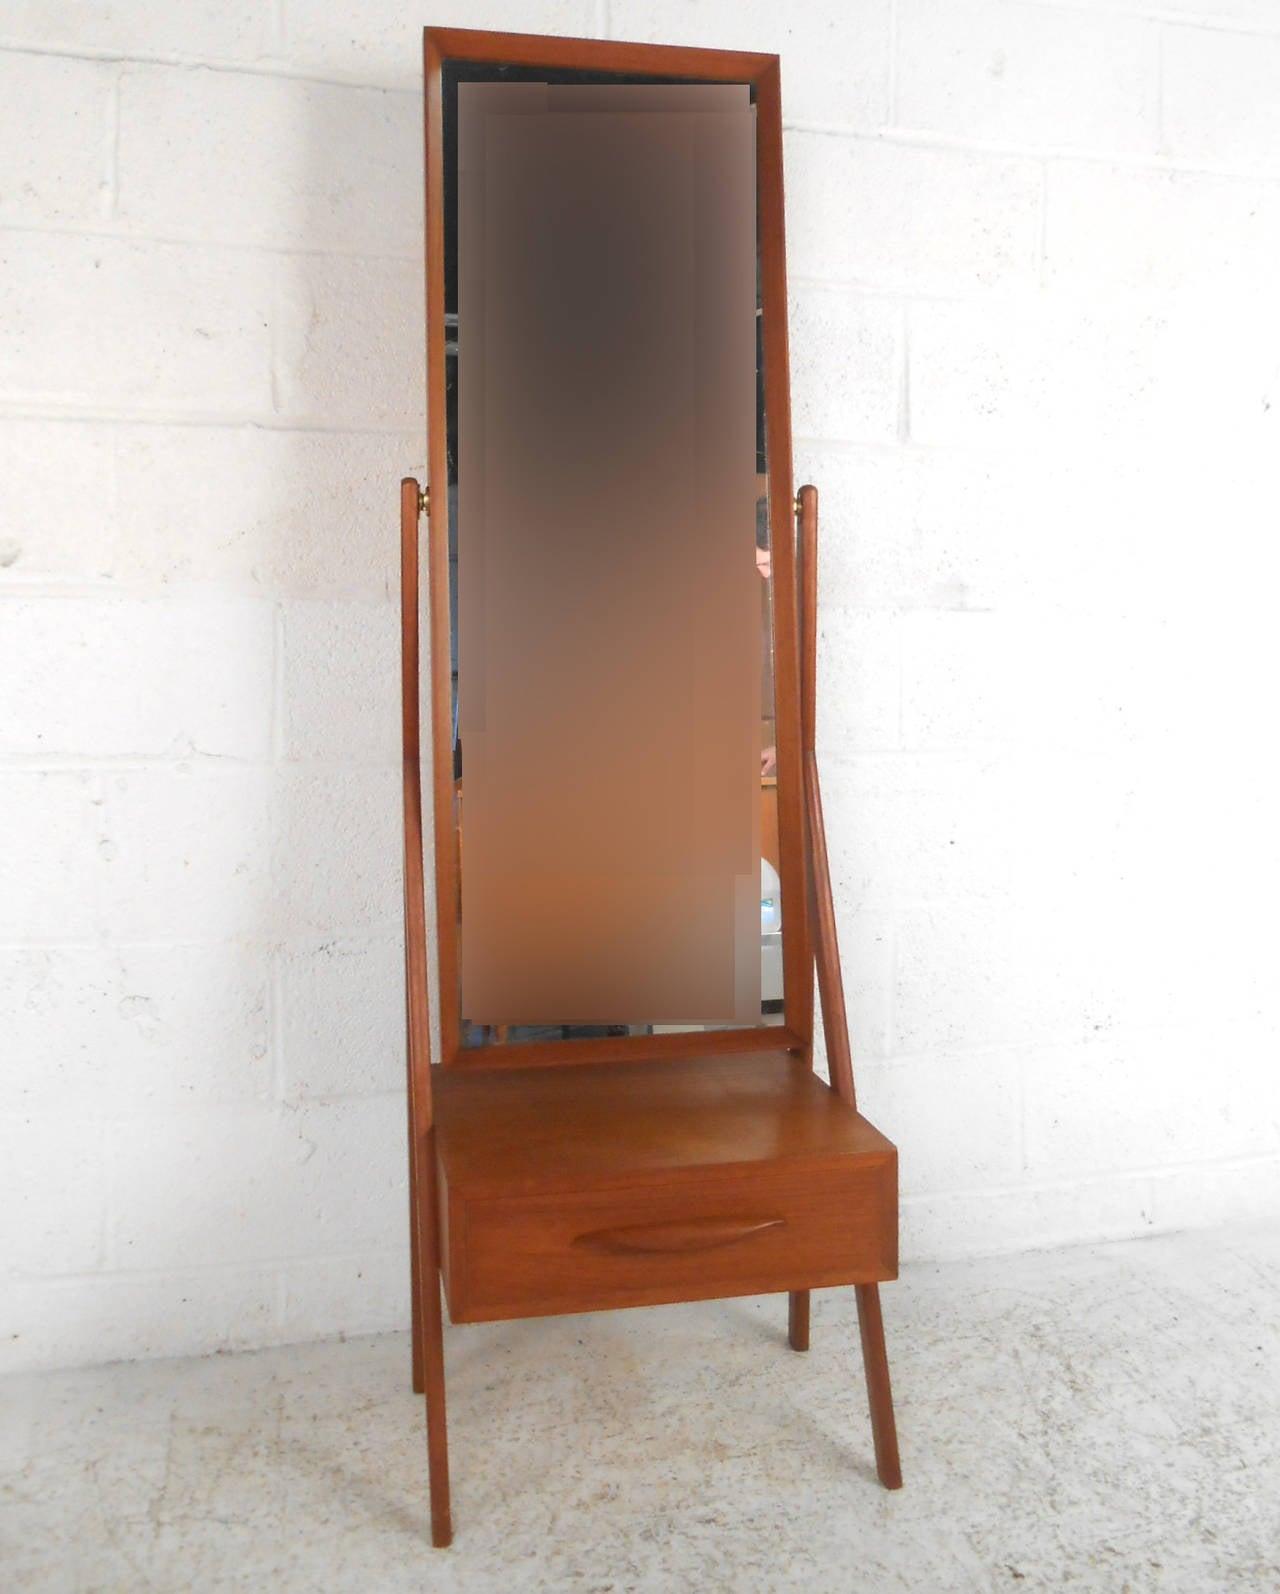 Mid century modern arne vodder teak cheval dressing mirror for sale at 1stdibs for Dressing mirror